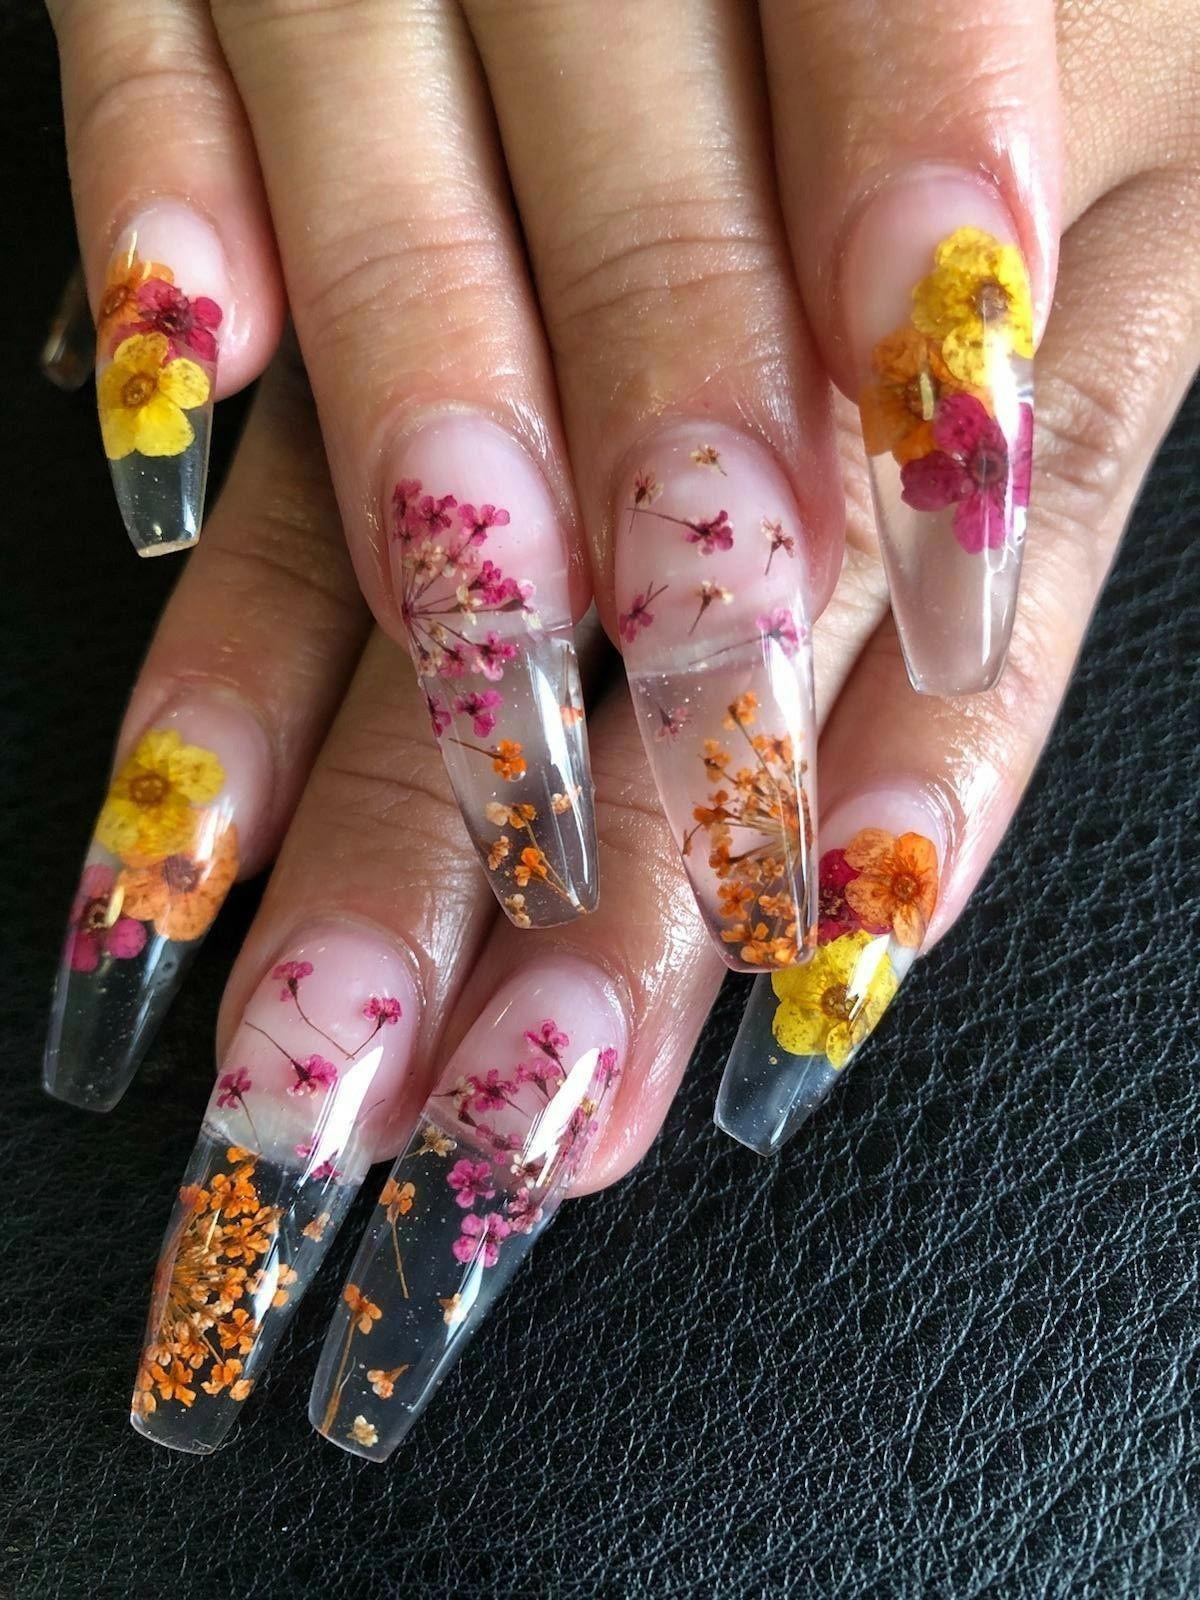 dried flower acrylic nails #acrylicnaildesign